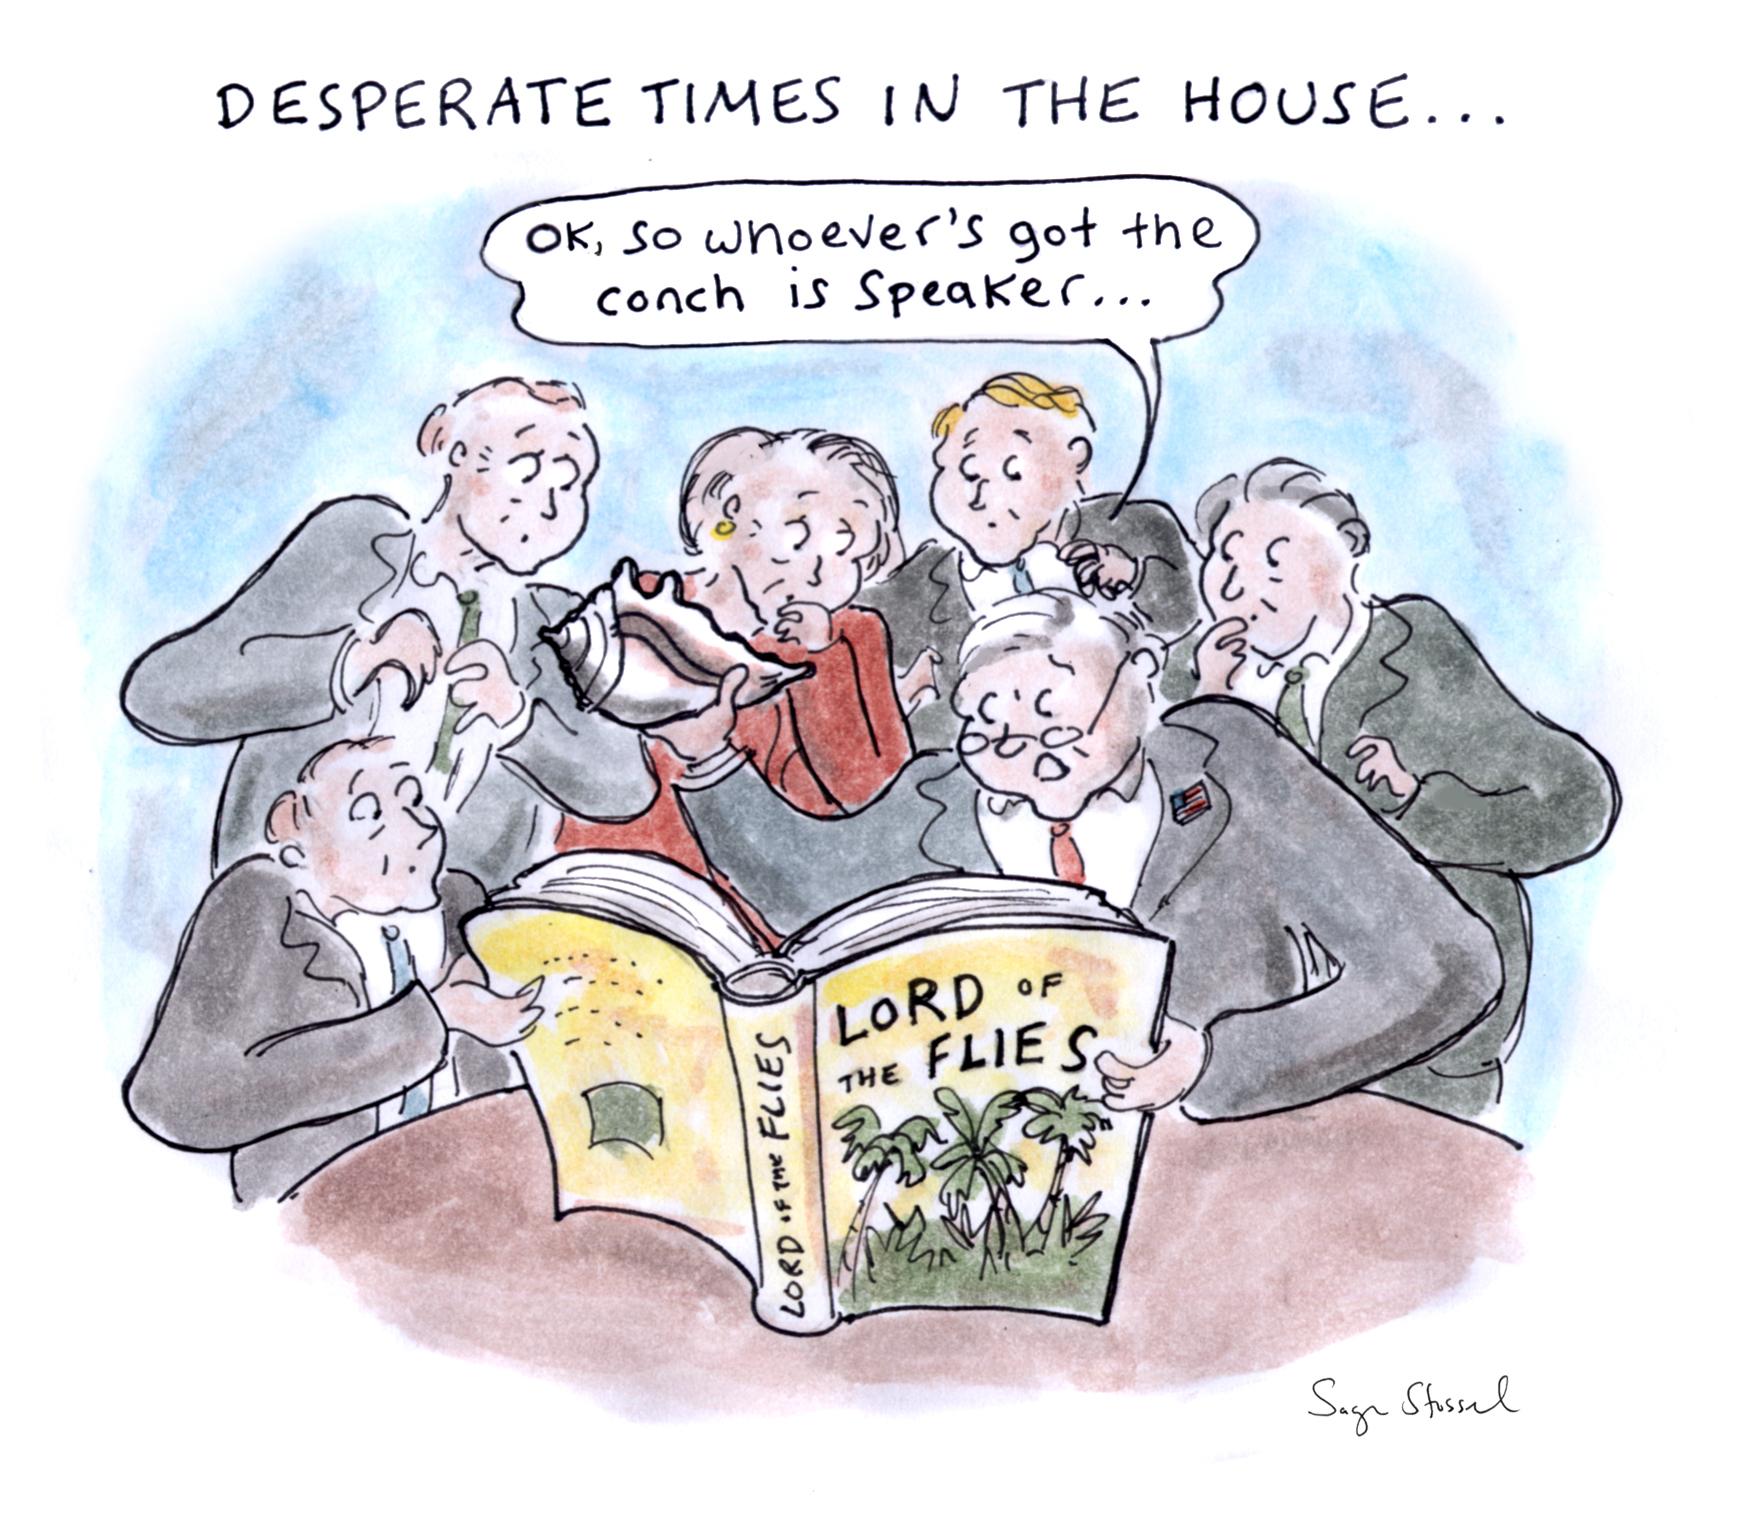 house speaker, paul ryan, john boehner, kevin mccarthy, freedom caucus, speaker's gavel, ungovernable, coalition, gop, congress, cartoon